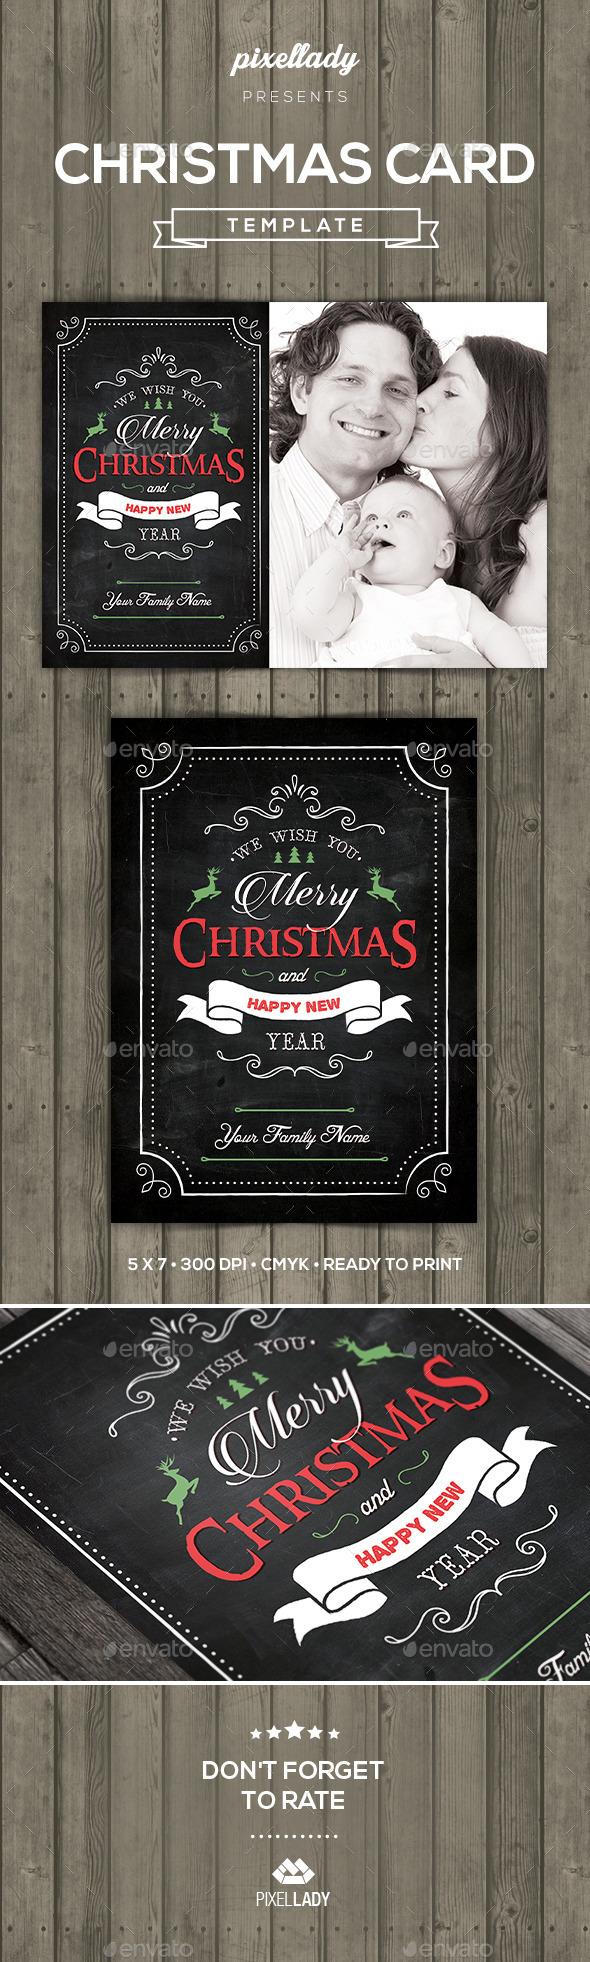 Christmas Chalkboard Greeting Card - Holiday Greeting Cards